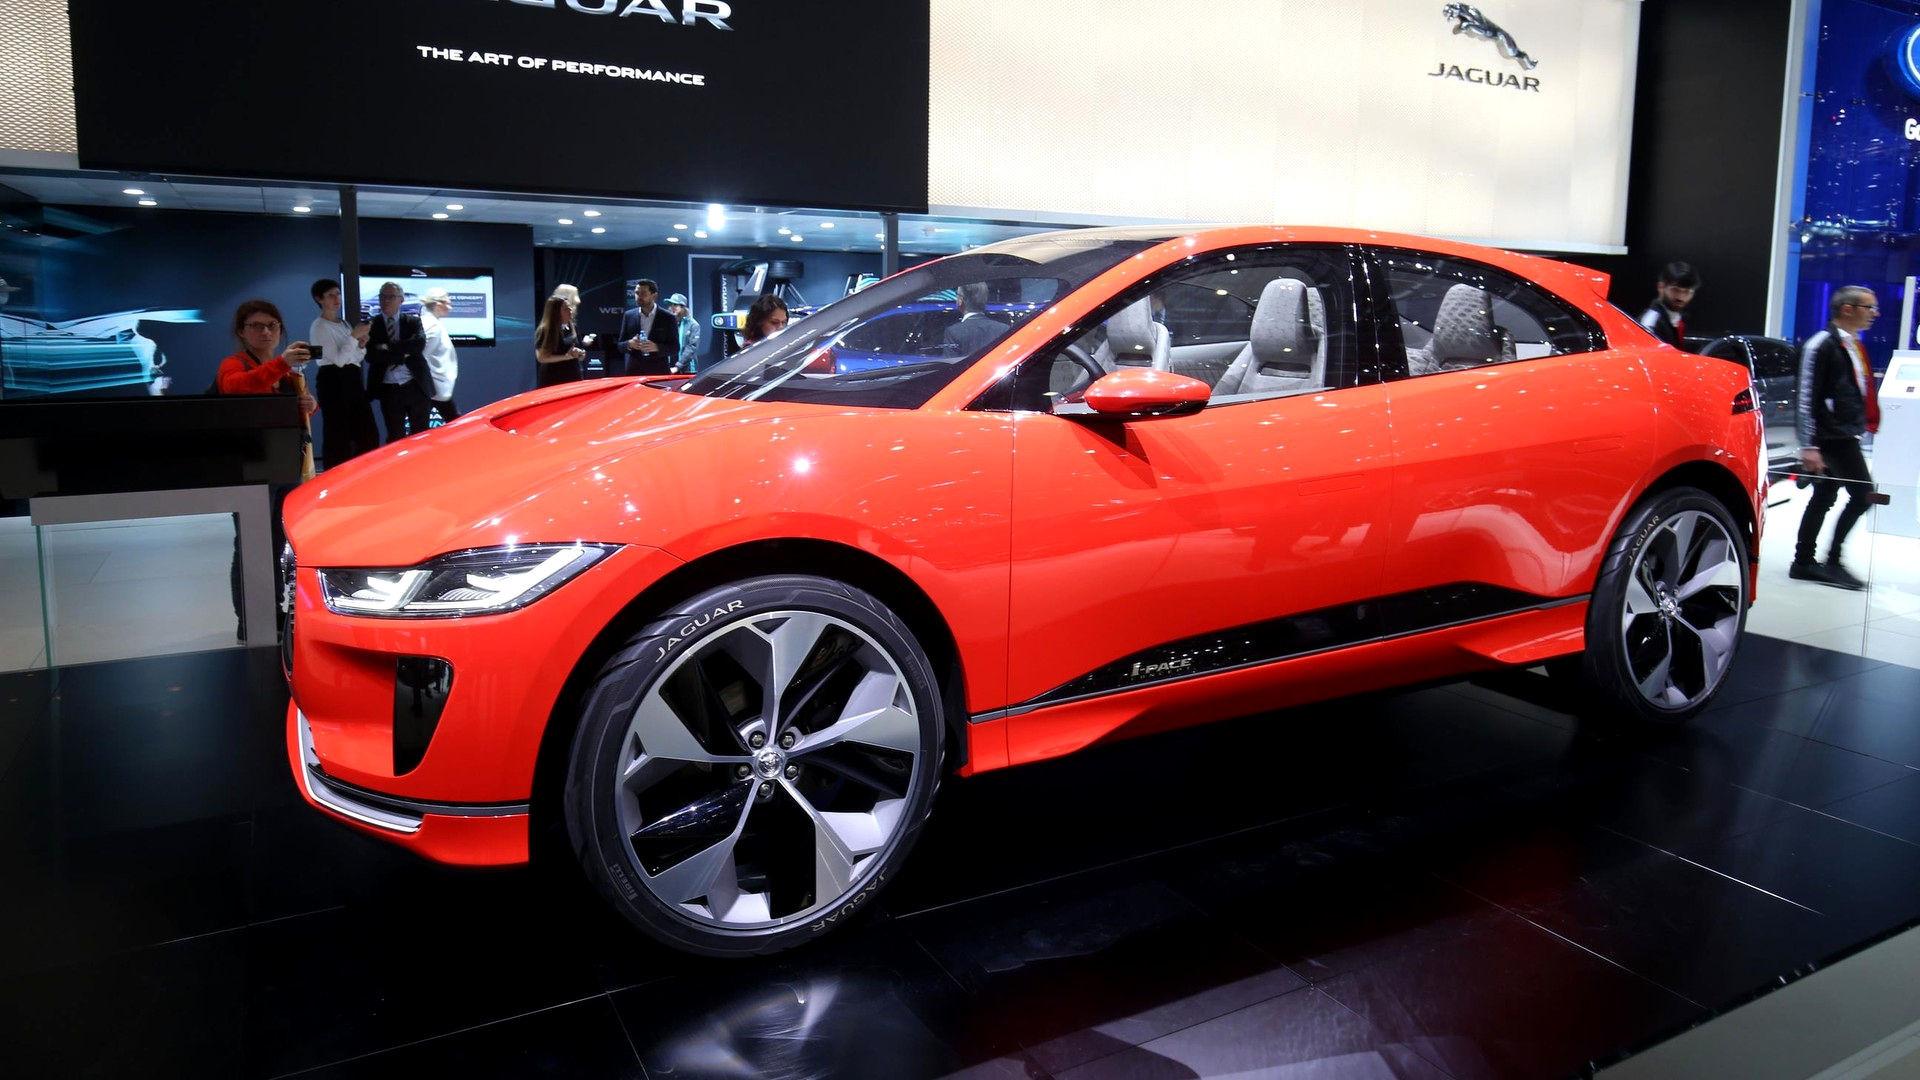 dealership of ca jaguar best angeles autotrader newsfeatures los show auto the